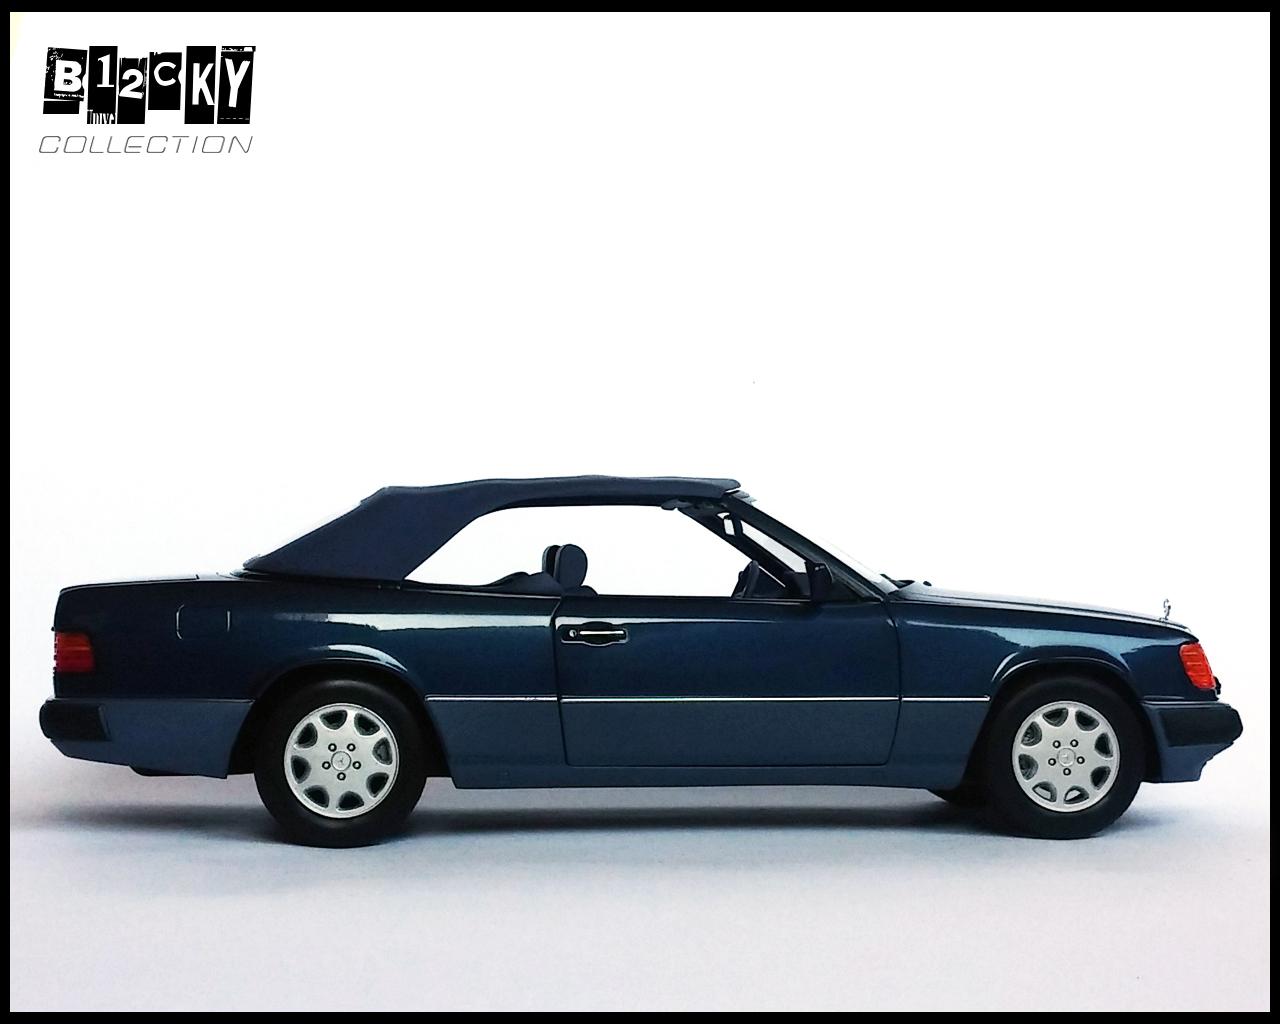 mercedes benz a124 300 ce 24 norev dx sedan coupe convertible diecast. Black Bedroom Furniture Sets. Home Design Ideas